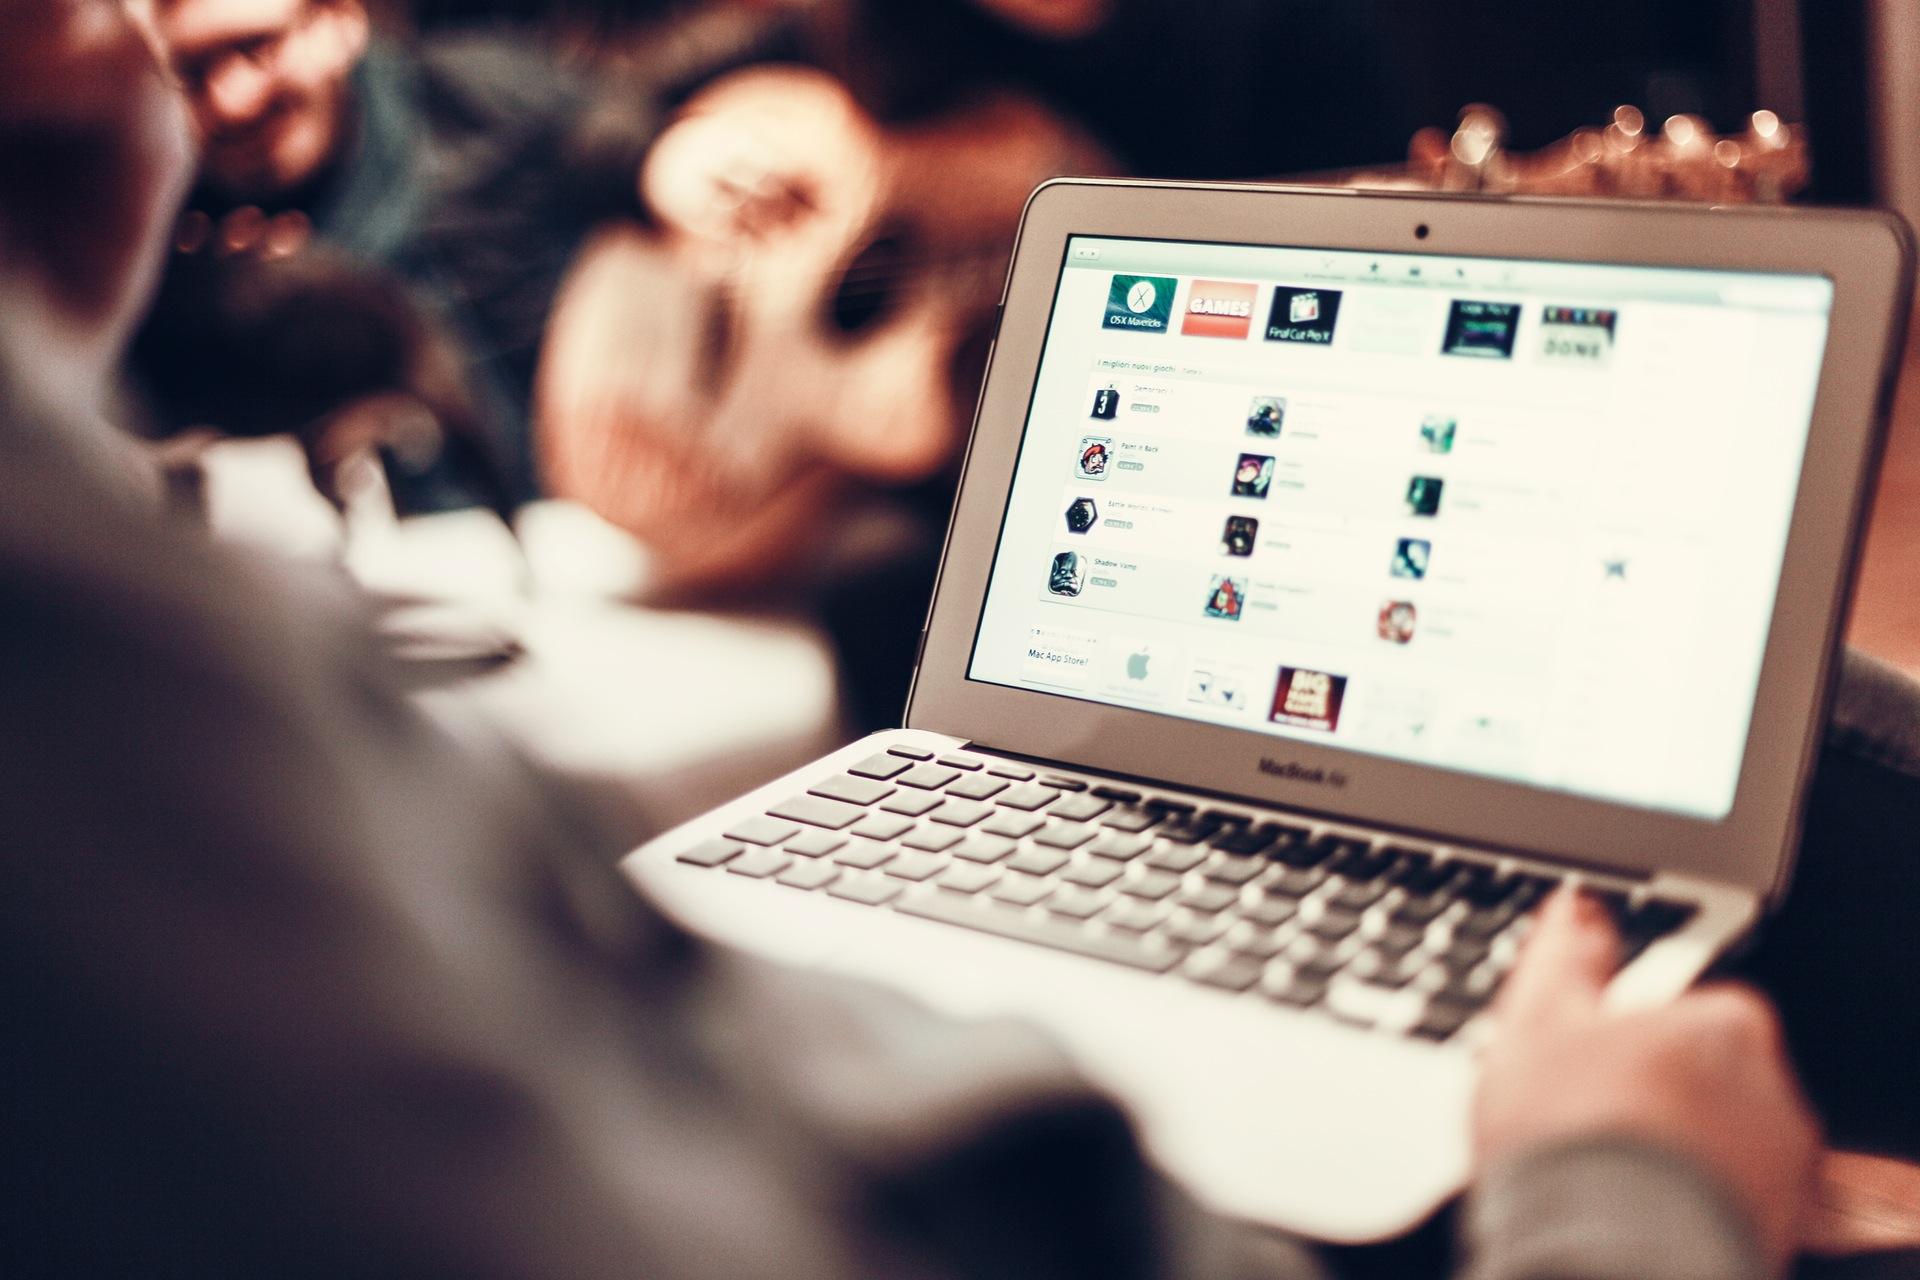 20 wskazówek jak zbudować zaangażowanie na Facebooku TOP 100 person apple laptop notebook